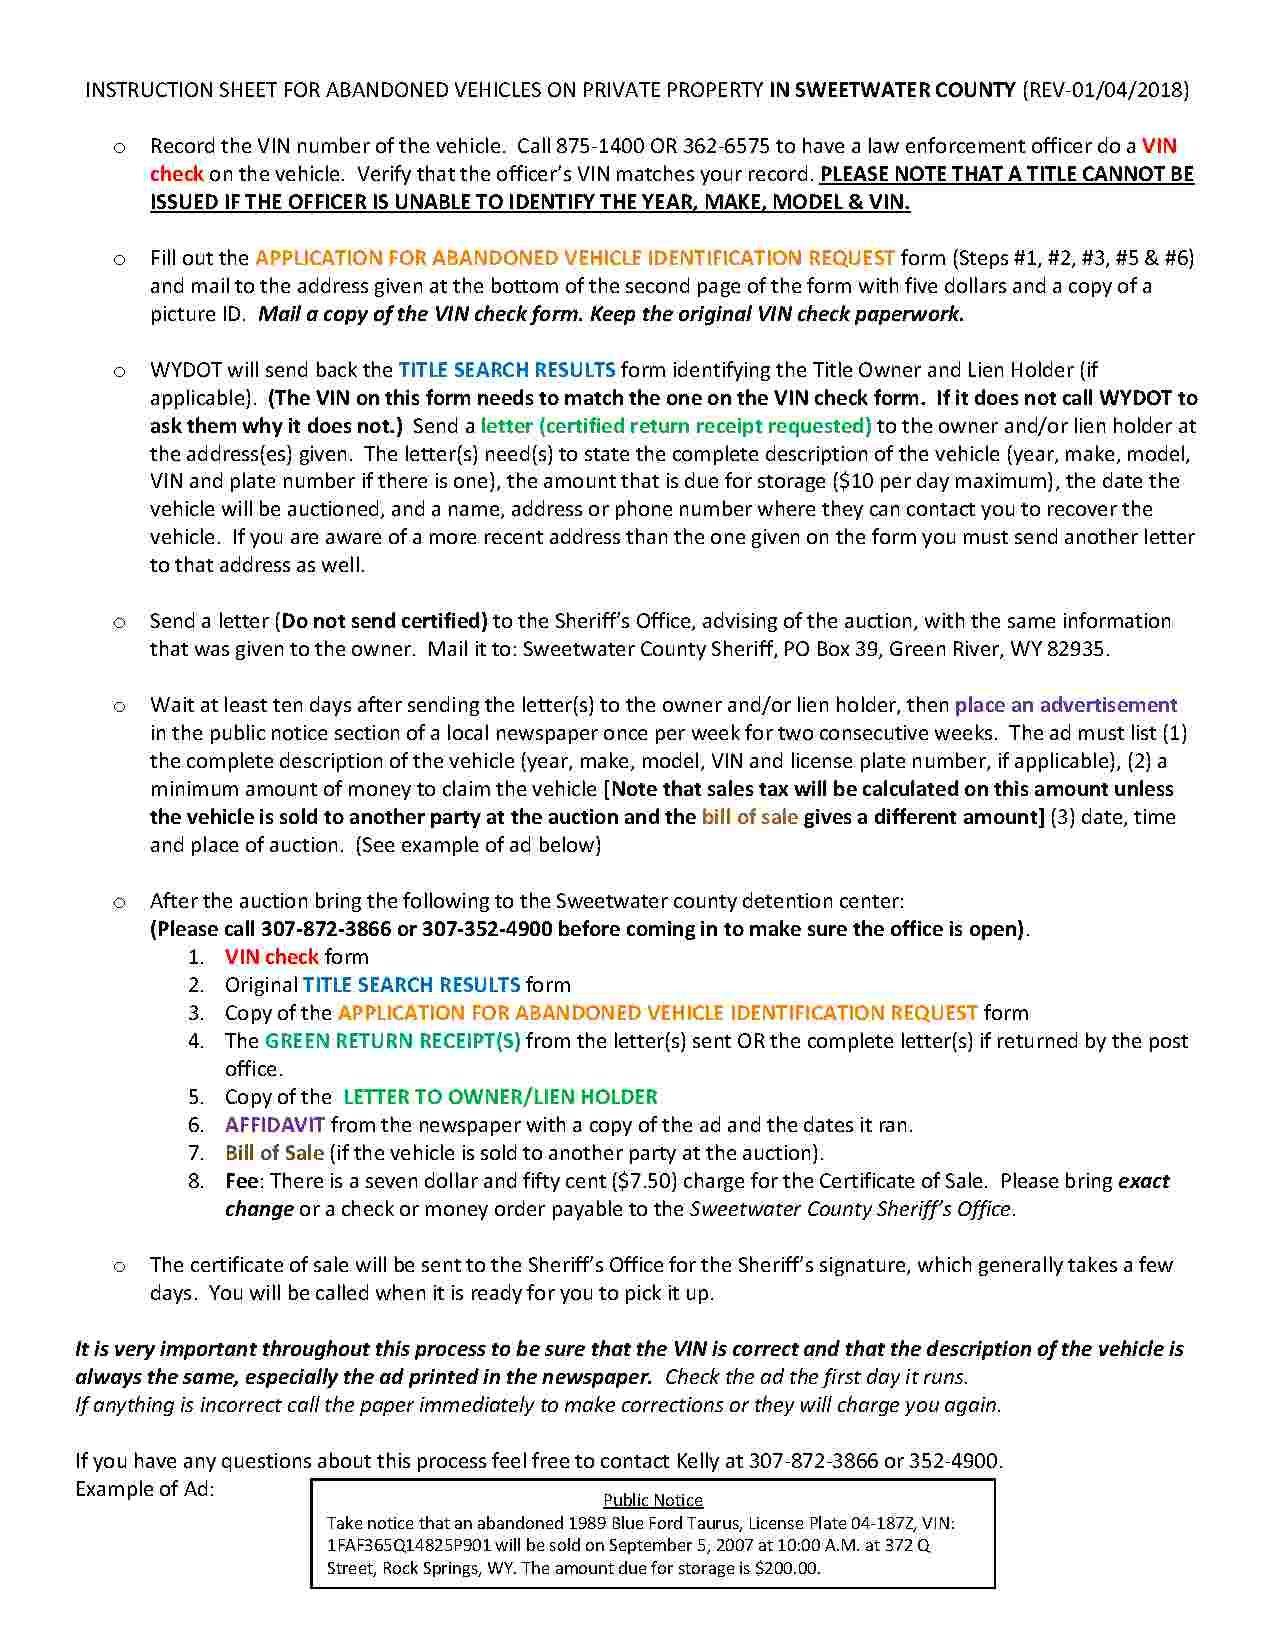 Verification Worksheet For Dependent Students